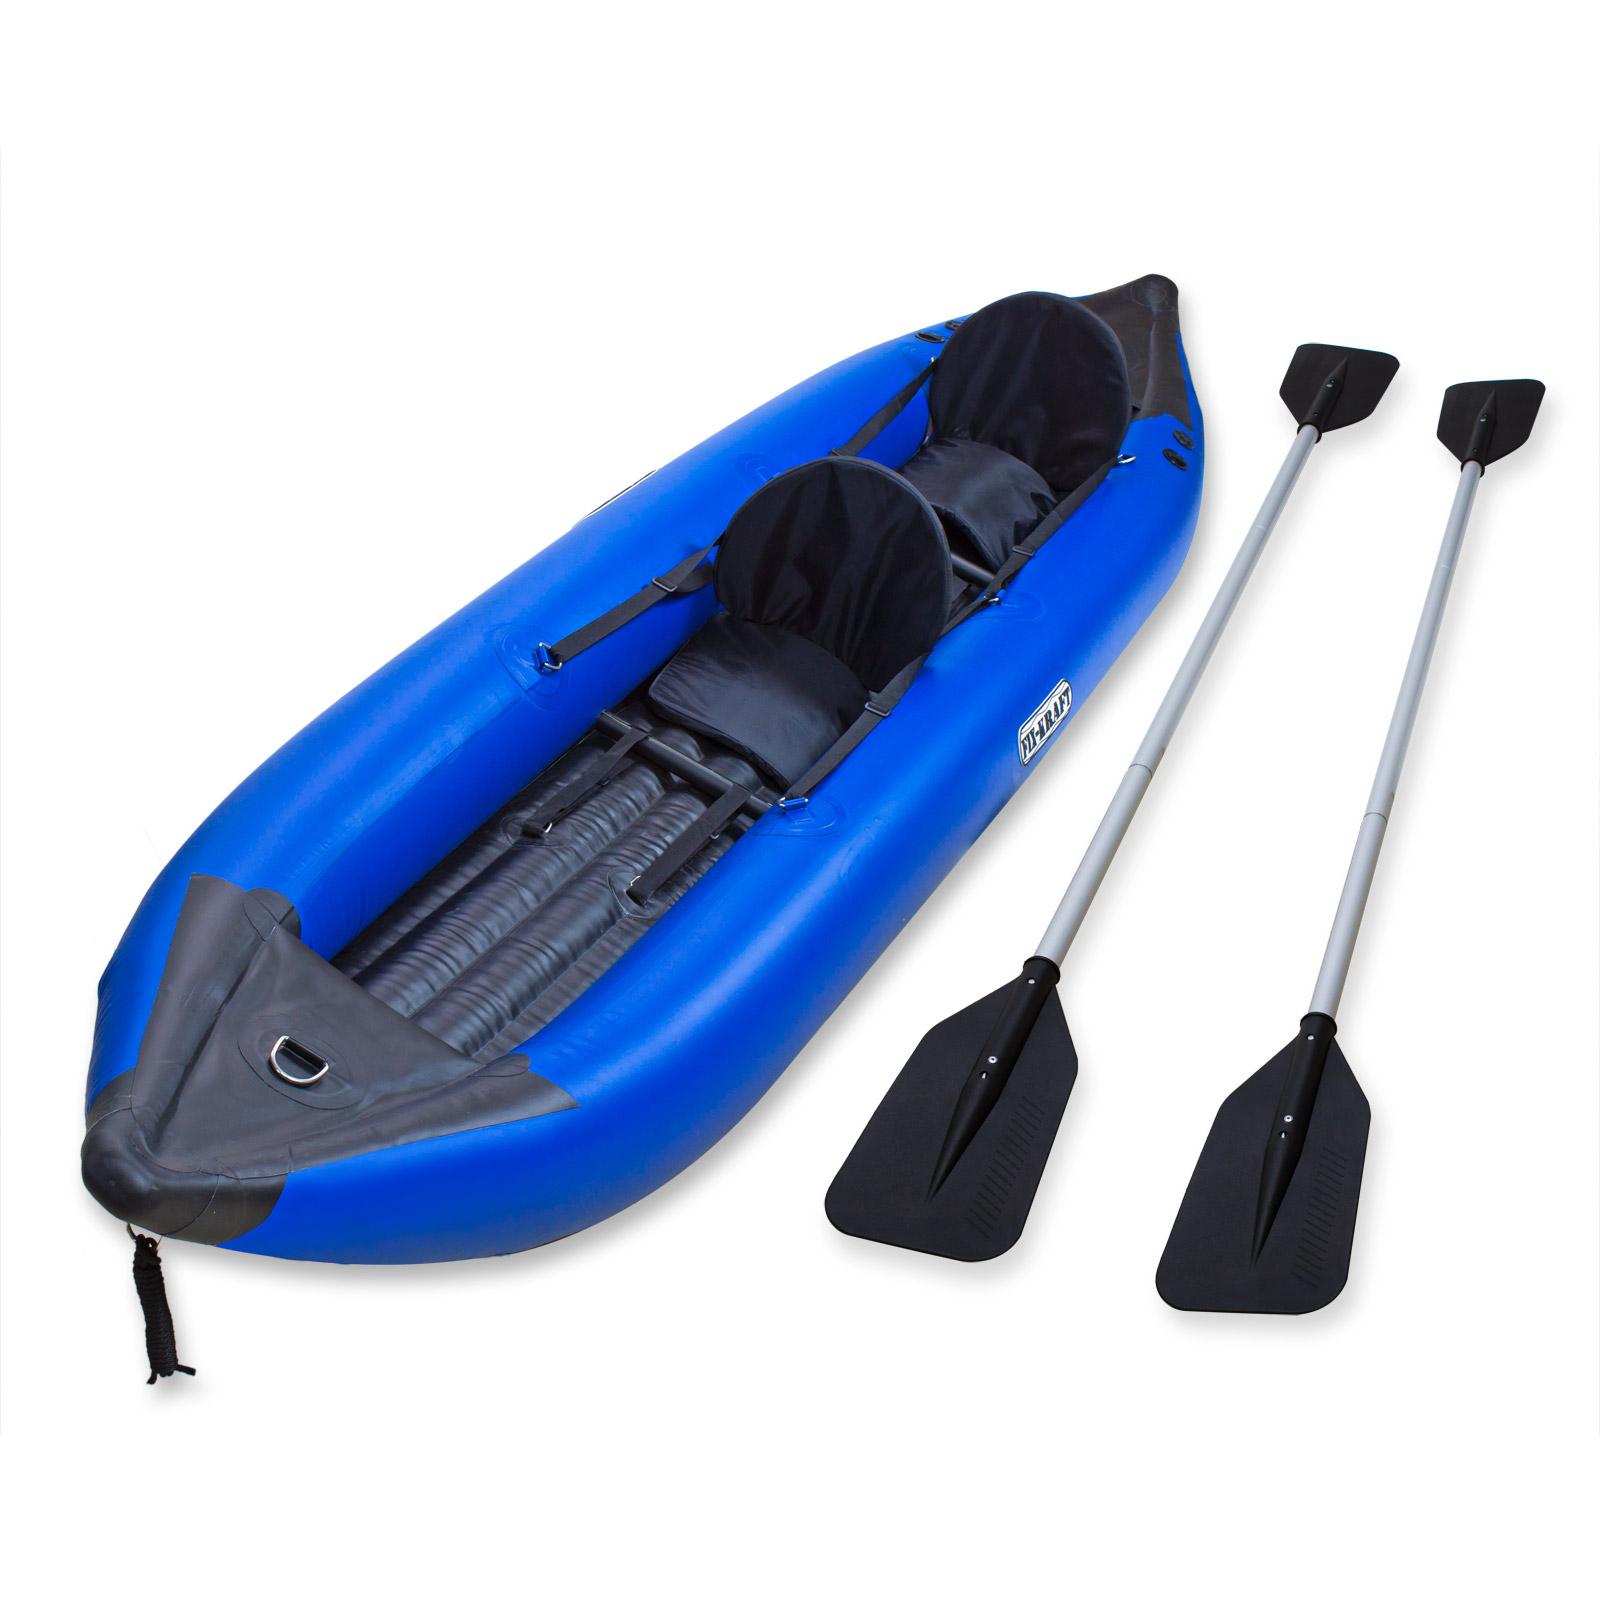 918295 fix kraft kajak schlauchboot 2 mann kayak kanu boot. Black Bedroom Furniture Sets. Home Design Ideas